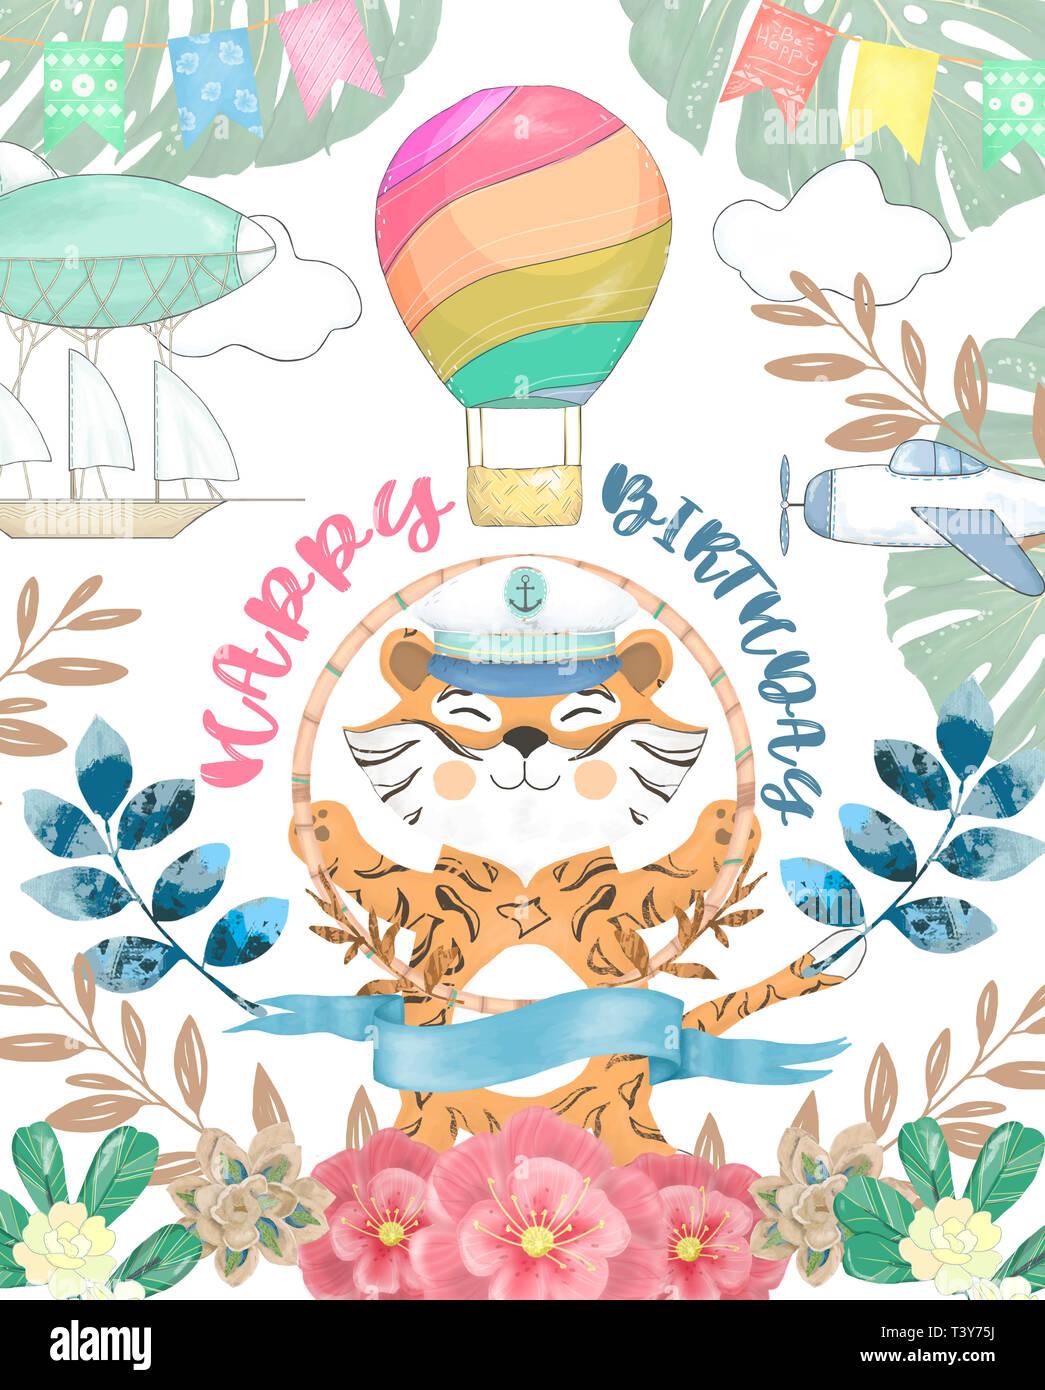 Joyeux Anniversaire Carte Avec Aquarelle Tigre Mignon Animal Mignon